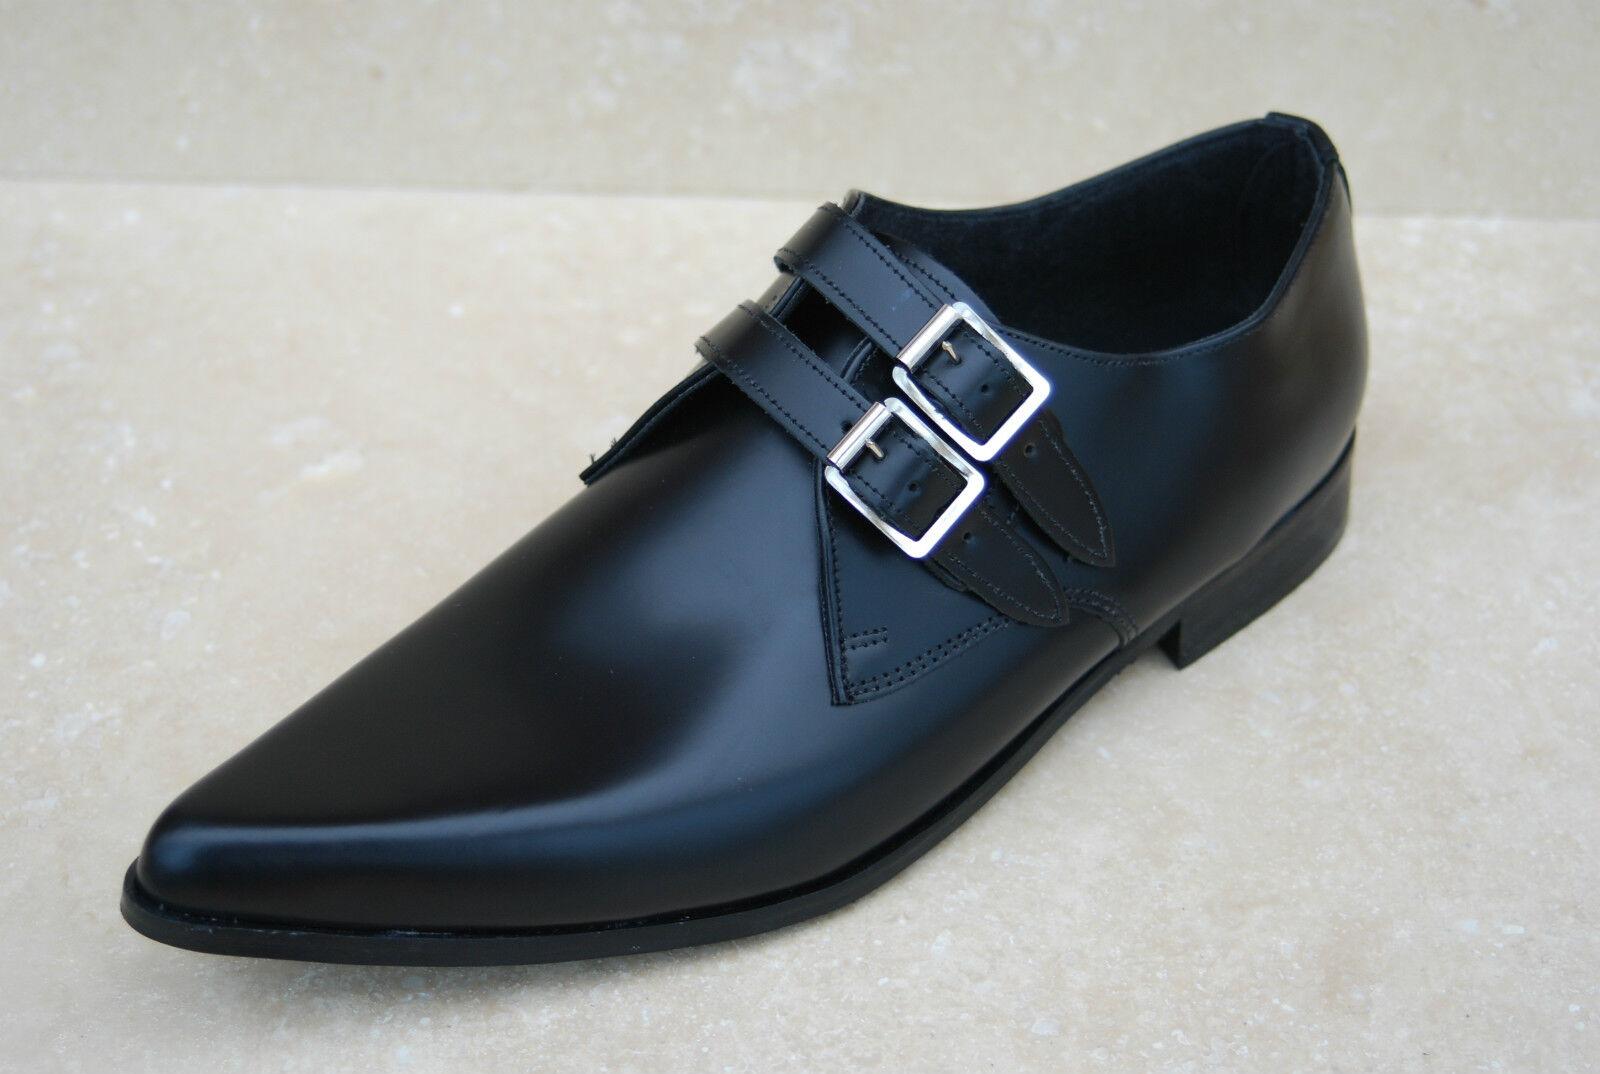 NEU Herren 2 Riemen schwarzes Leder Retro WINKLE Sole WINKLE Retro PICKER Schuhe c0a68c